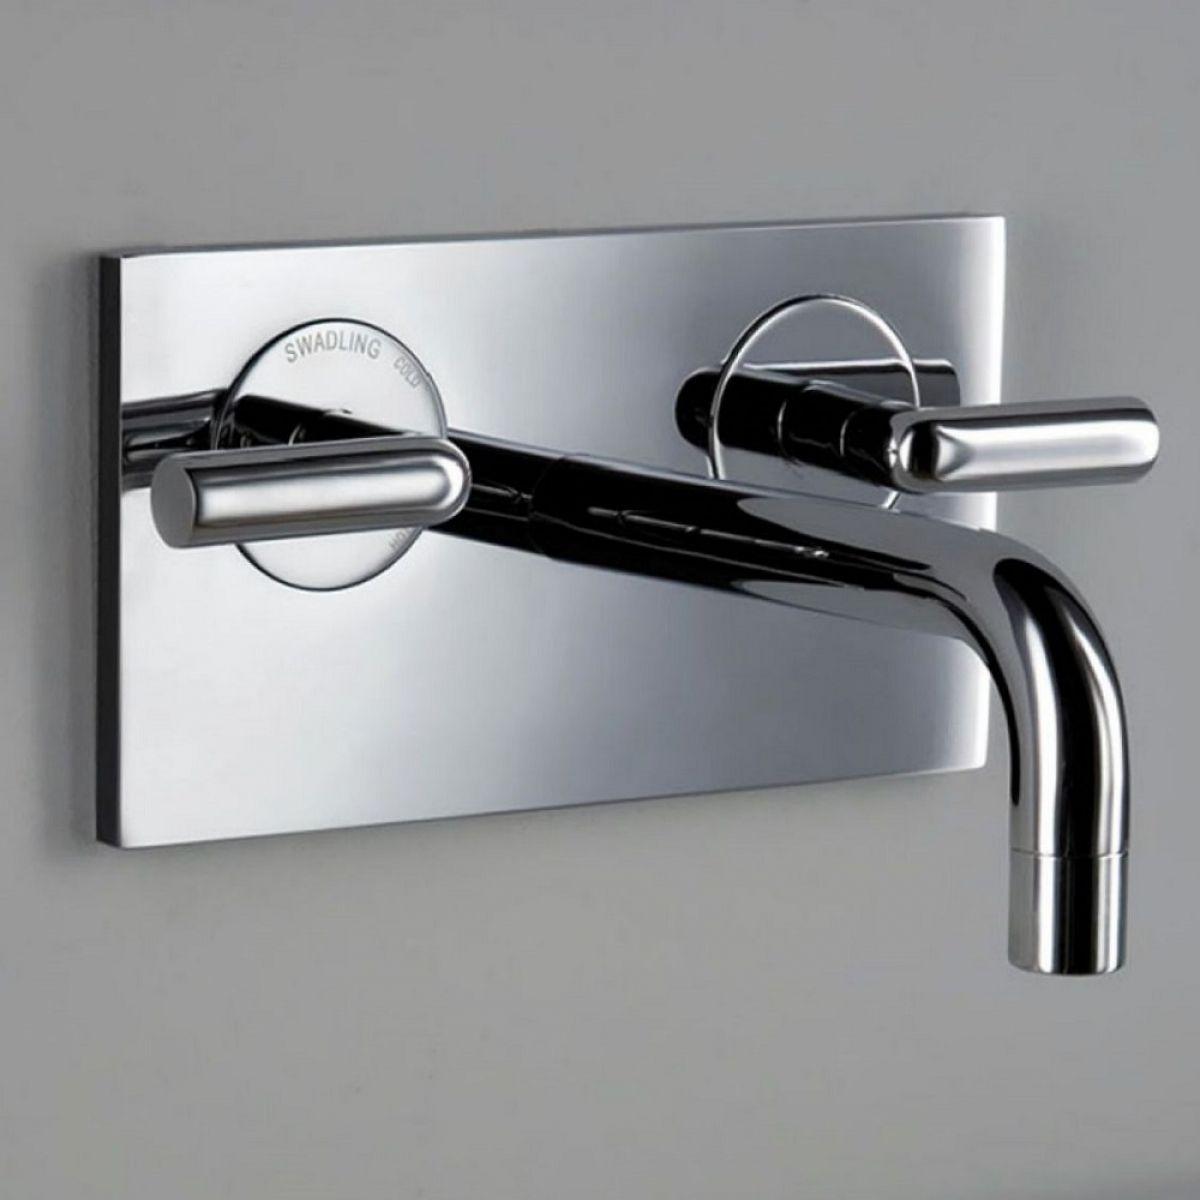 Matki Swadling New Absolute 2 Contemporary Wall Bath Mixer Tap 2C ...